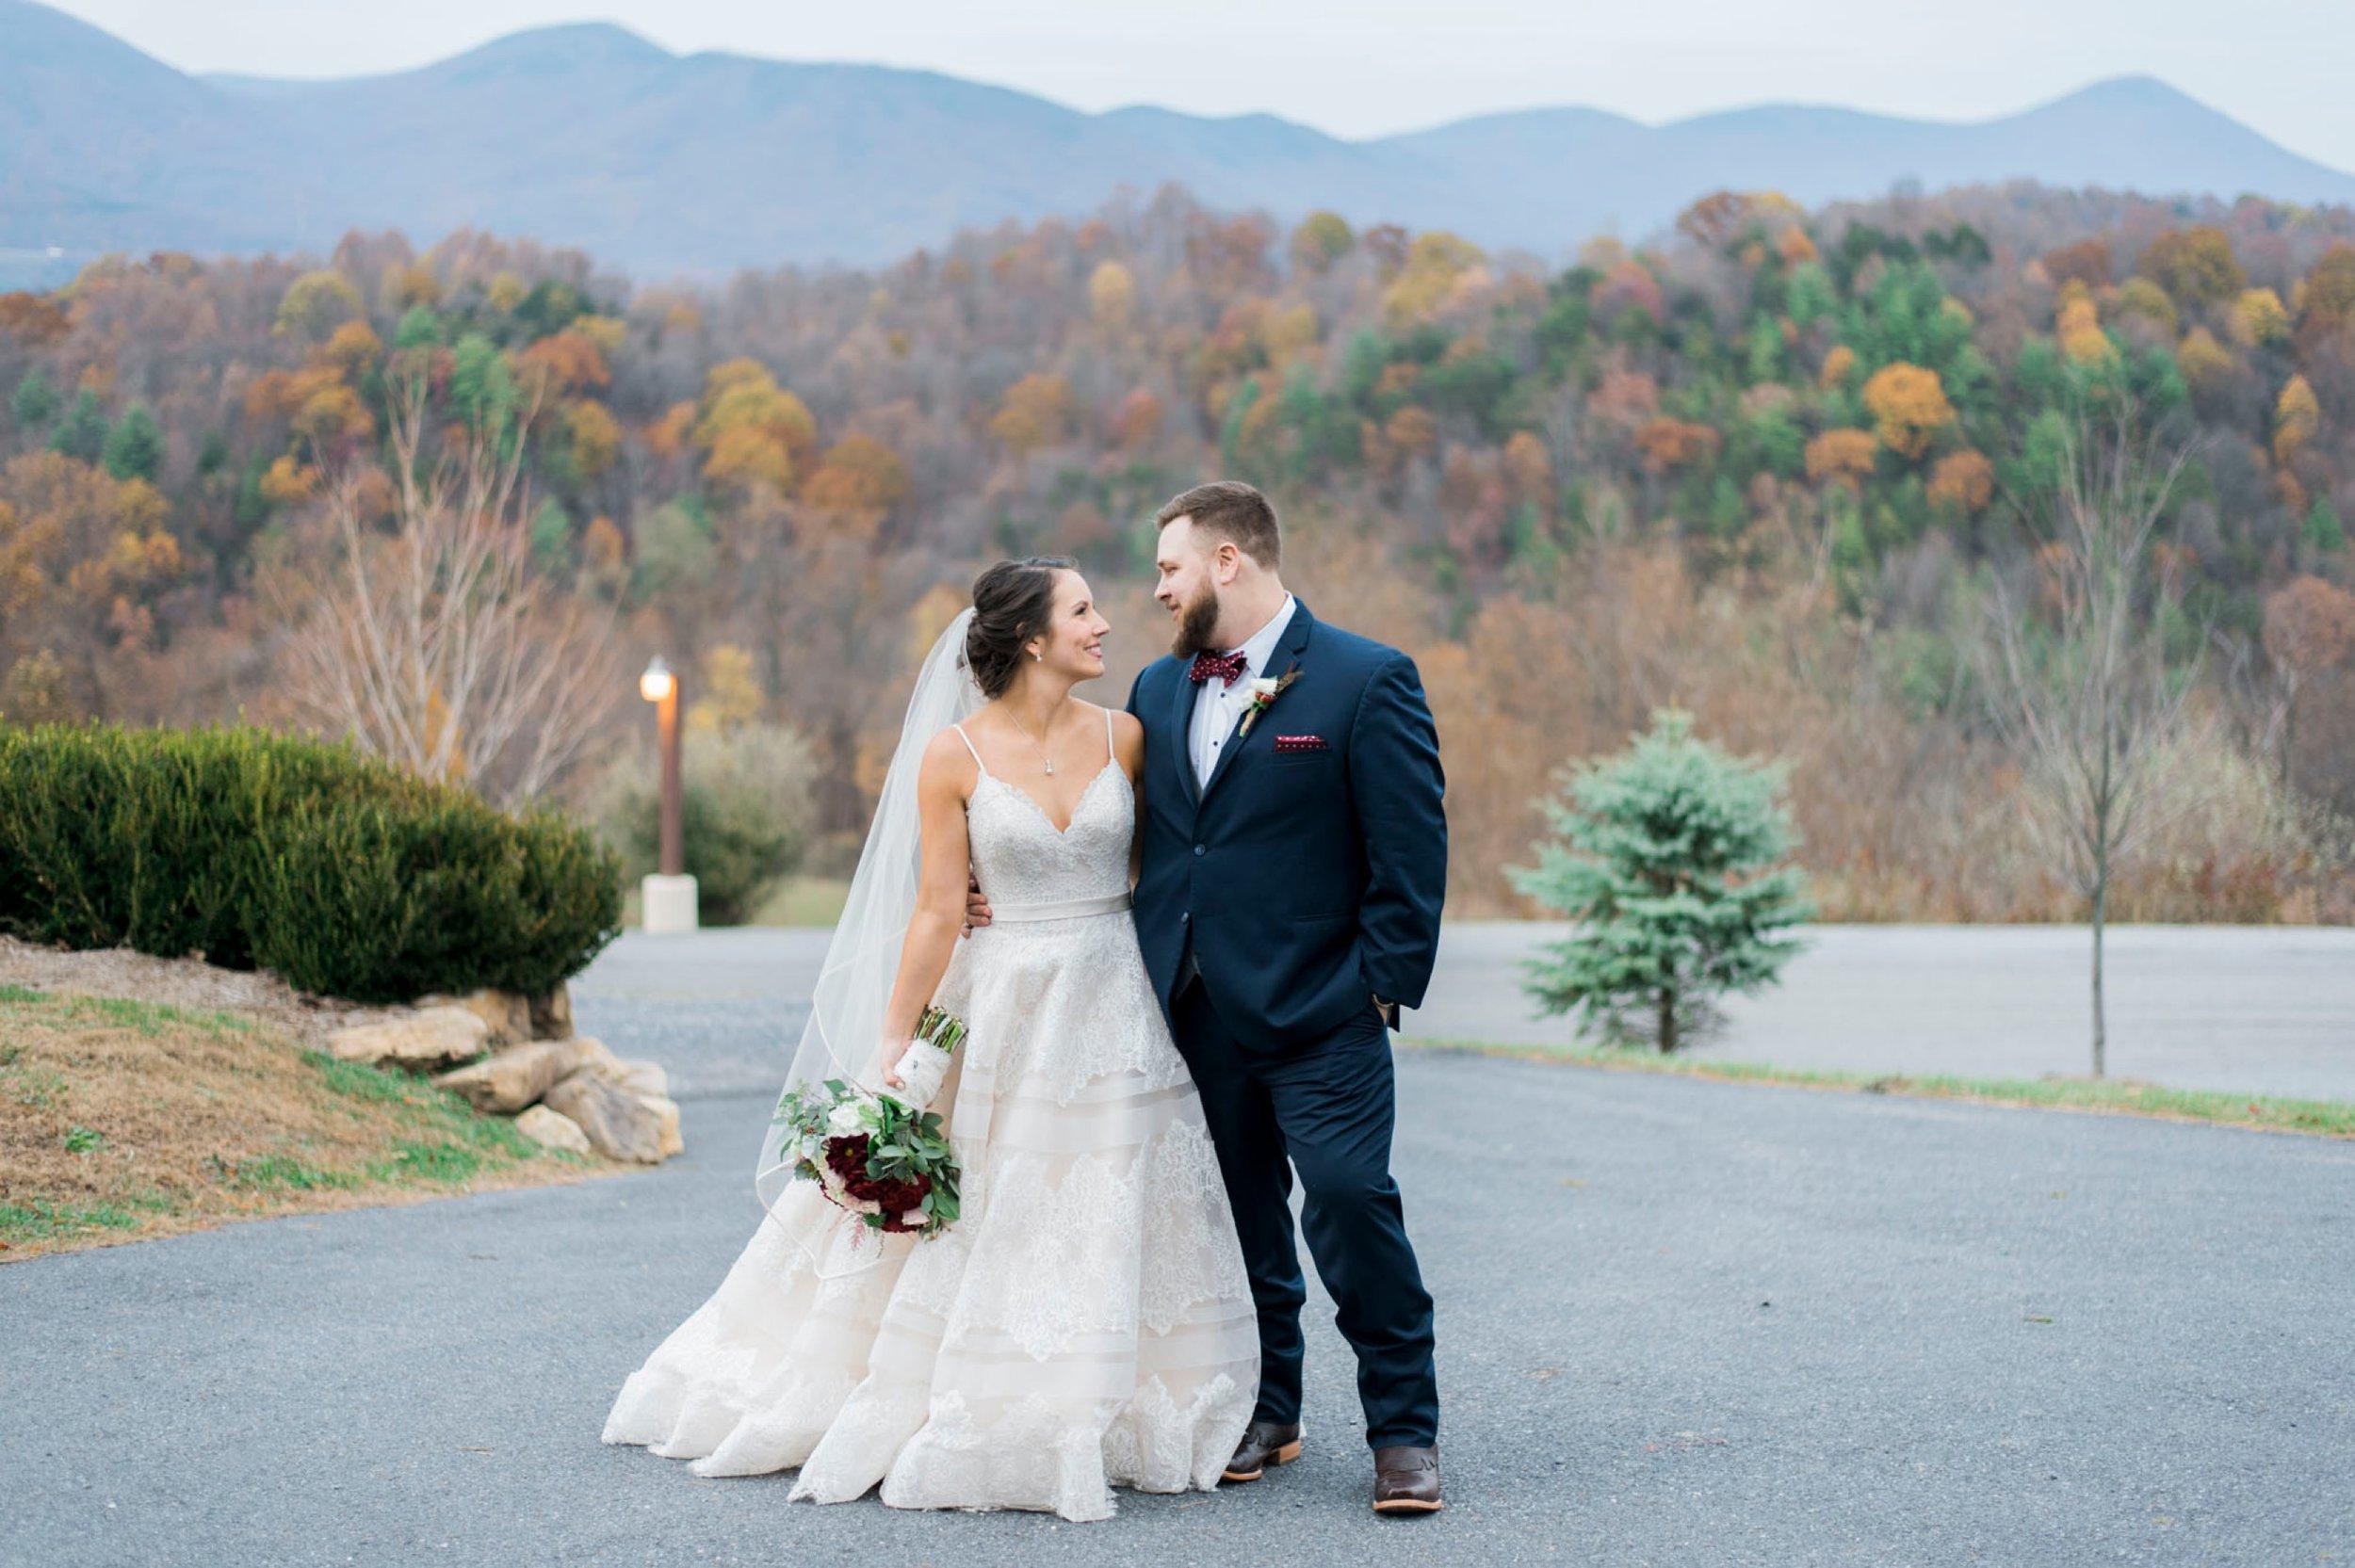 IrvineEstate_LexingtonVA_Wedding_FallWedding_VirginiaWeddingPhotographer 97.jpg